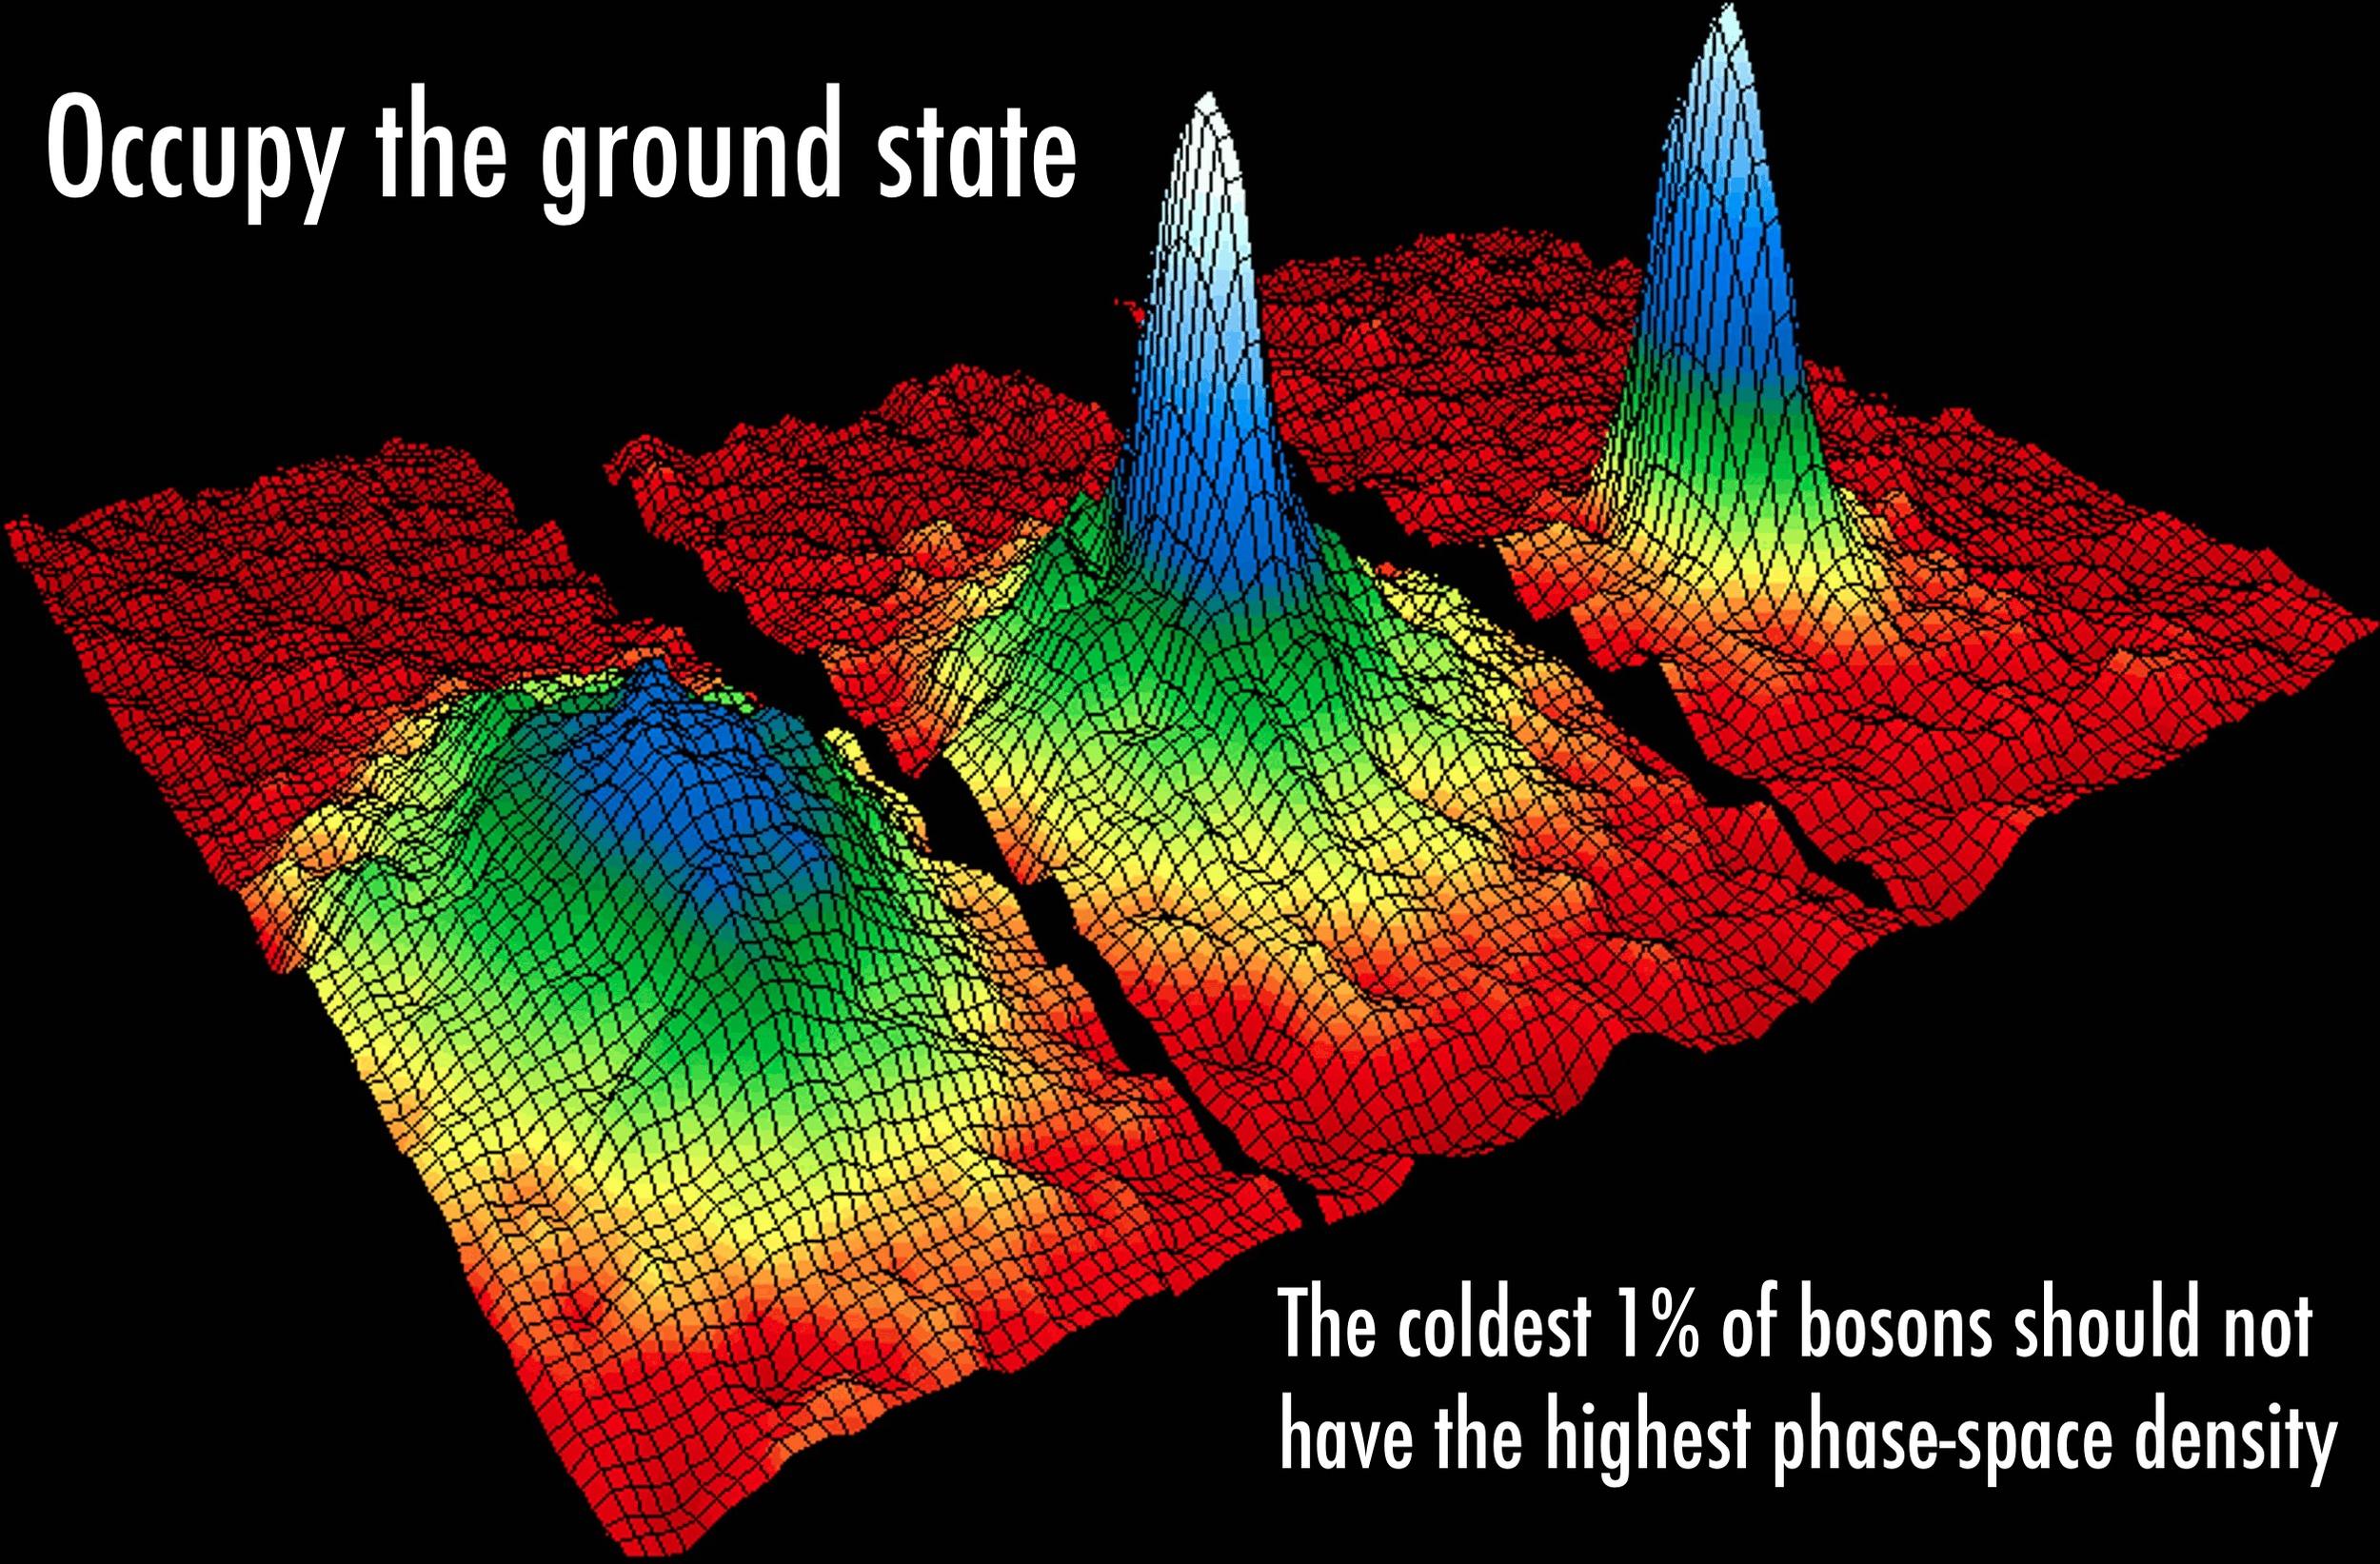 Occupy the ground state of a Bose-Einstein Condensate